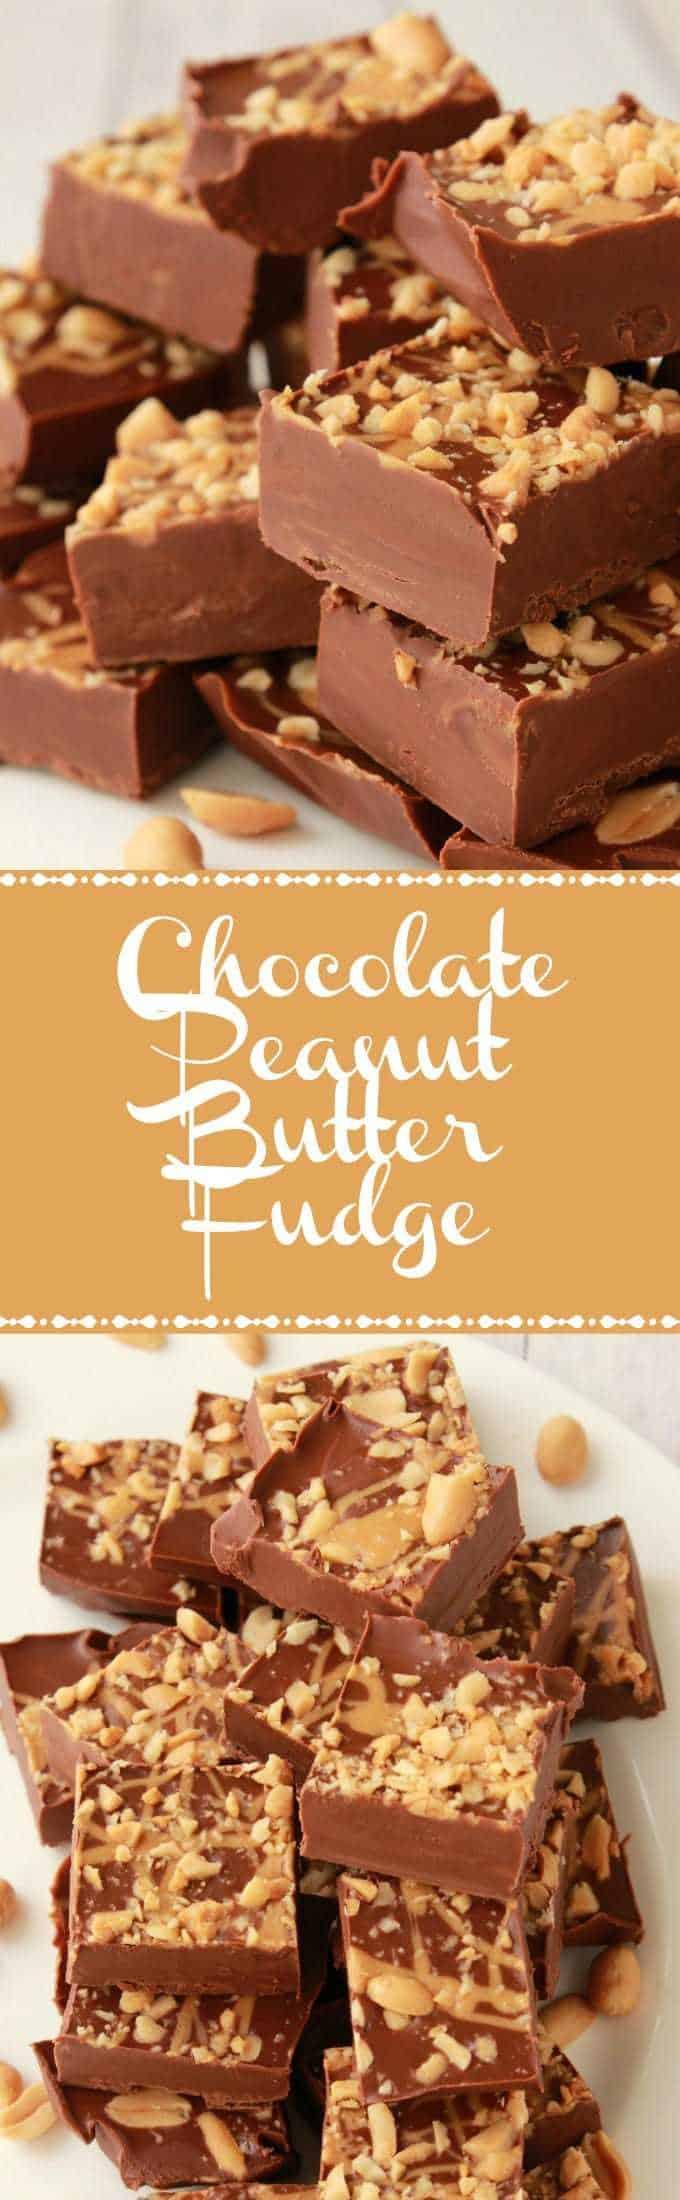 Chocolate Peanut Butter Fudge. Vegan and Gluten-Free. Vegan | Vegan Desserts | Gluten-Free | Gluten-Free Desserts | Vegan Recipes